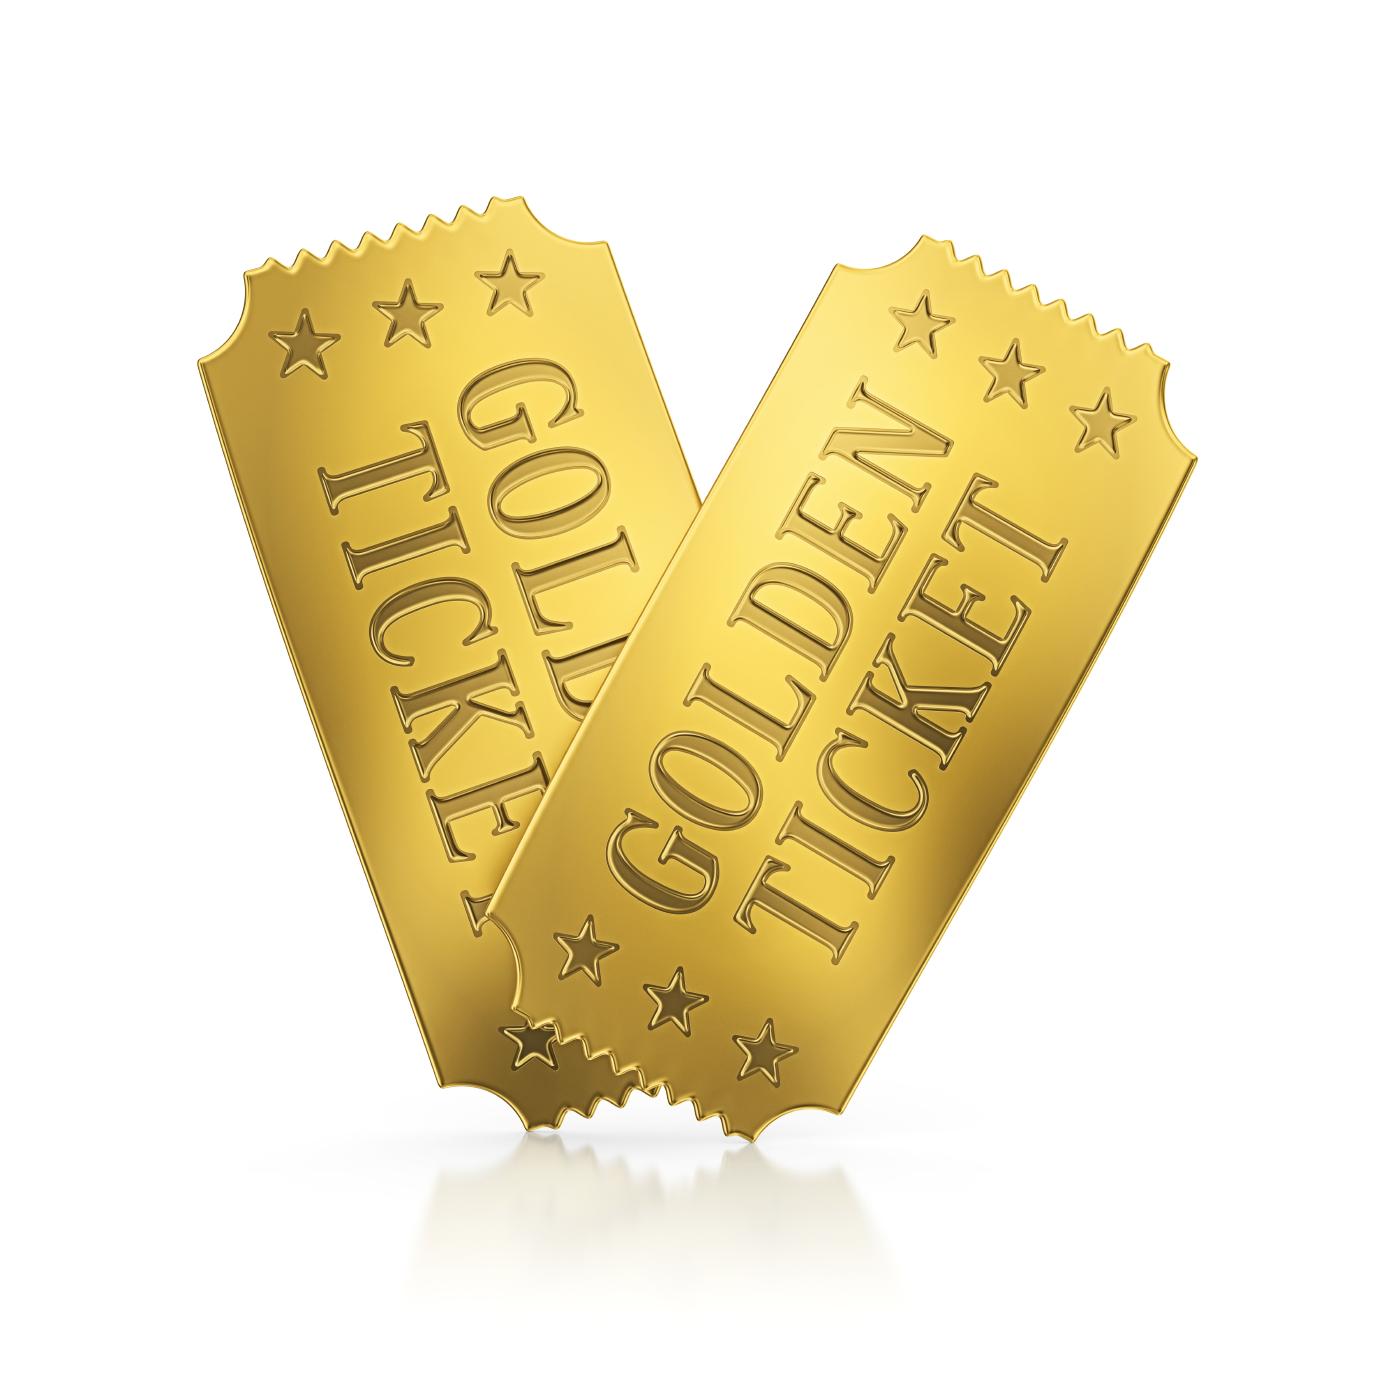 The Golden Ticket Trap - Herbert Scott